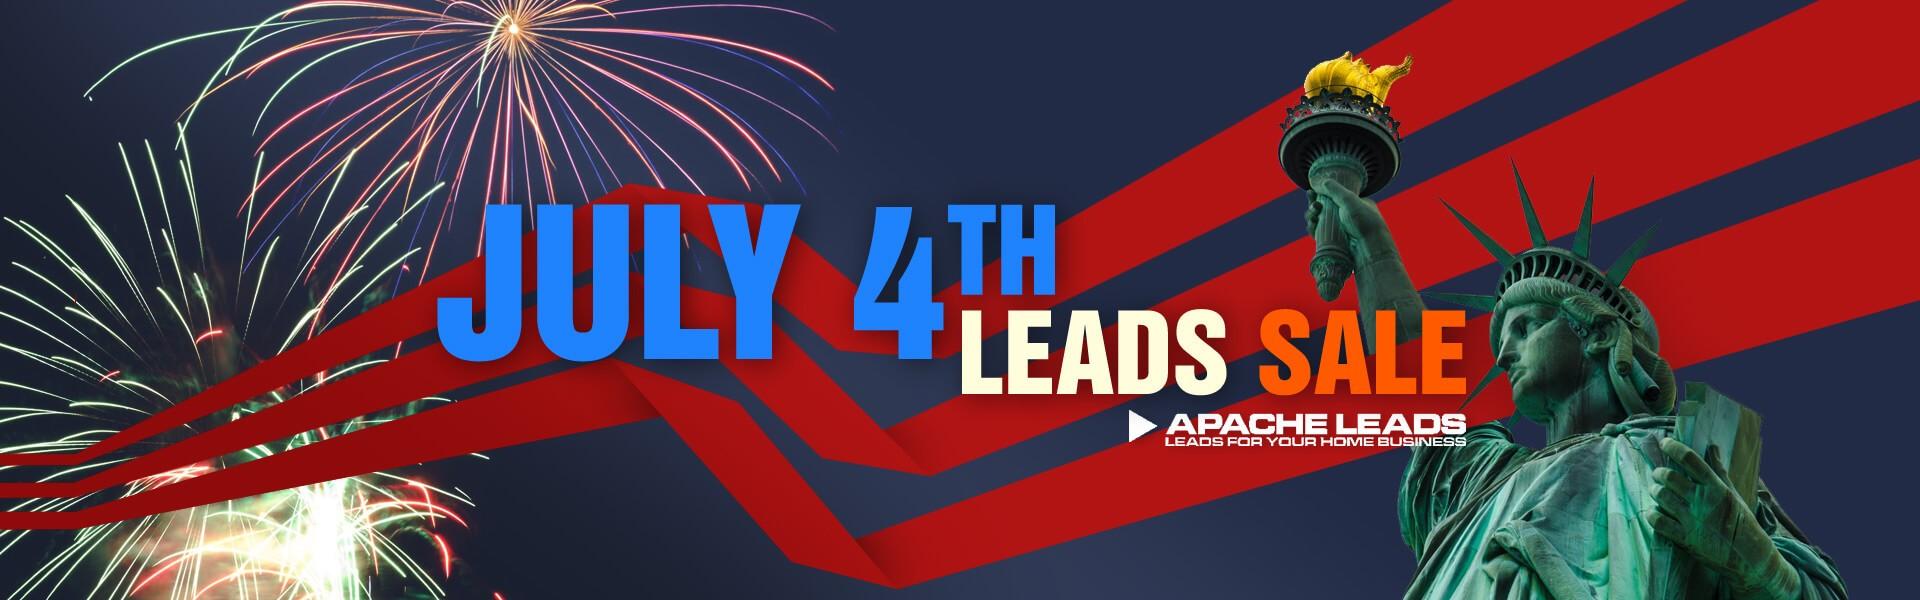 Happy July 4th Sale!